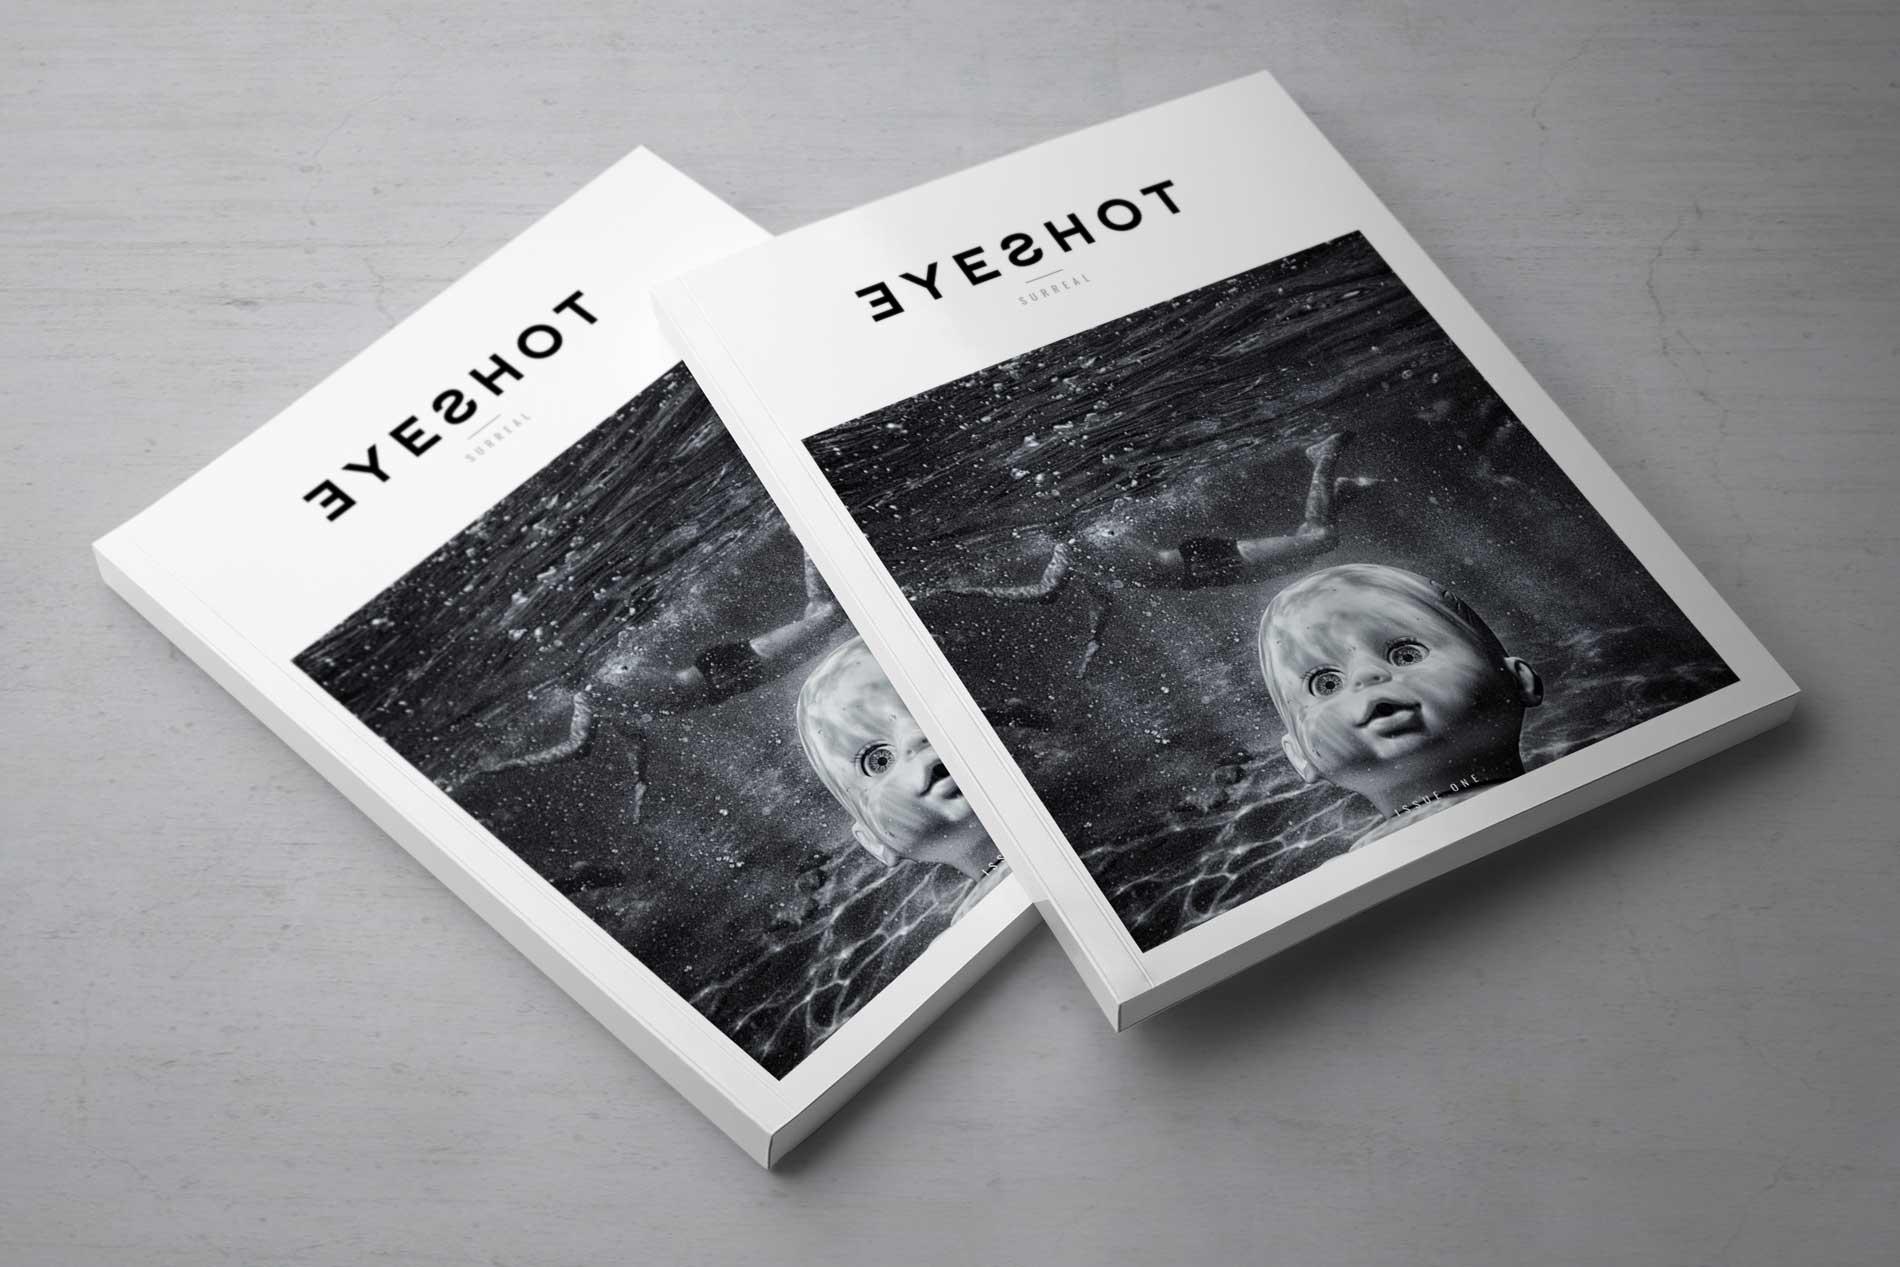 Eyeshot street photography magazine in paper and digital version